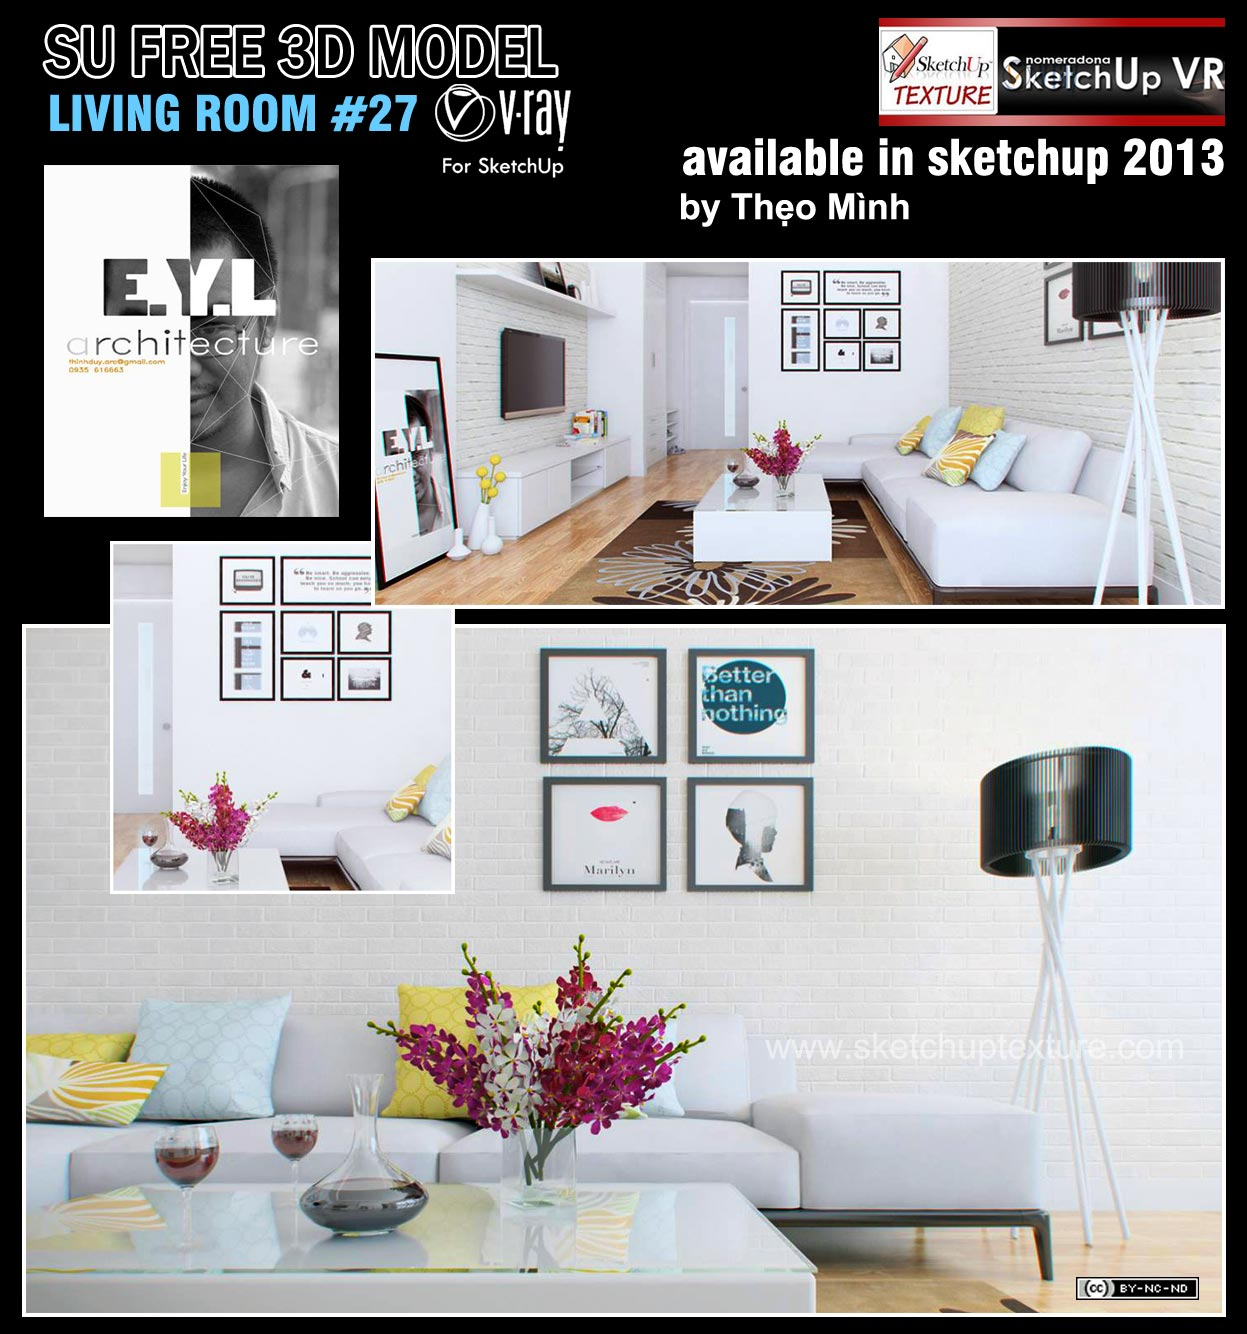 SKETCHUP TEXTURE: Free sketchup model moderne living room #27